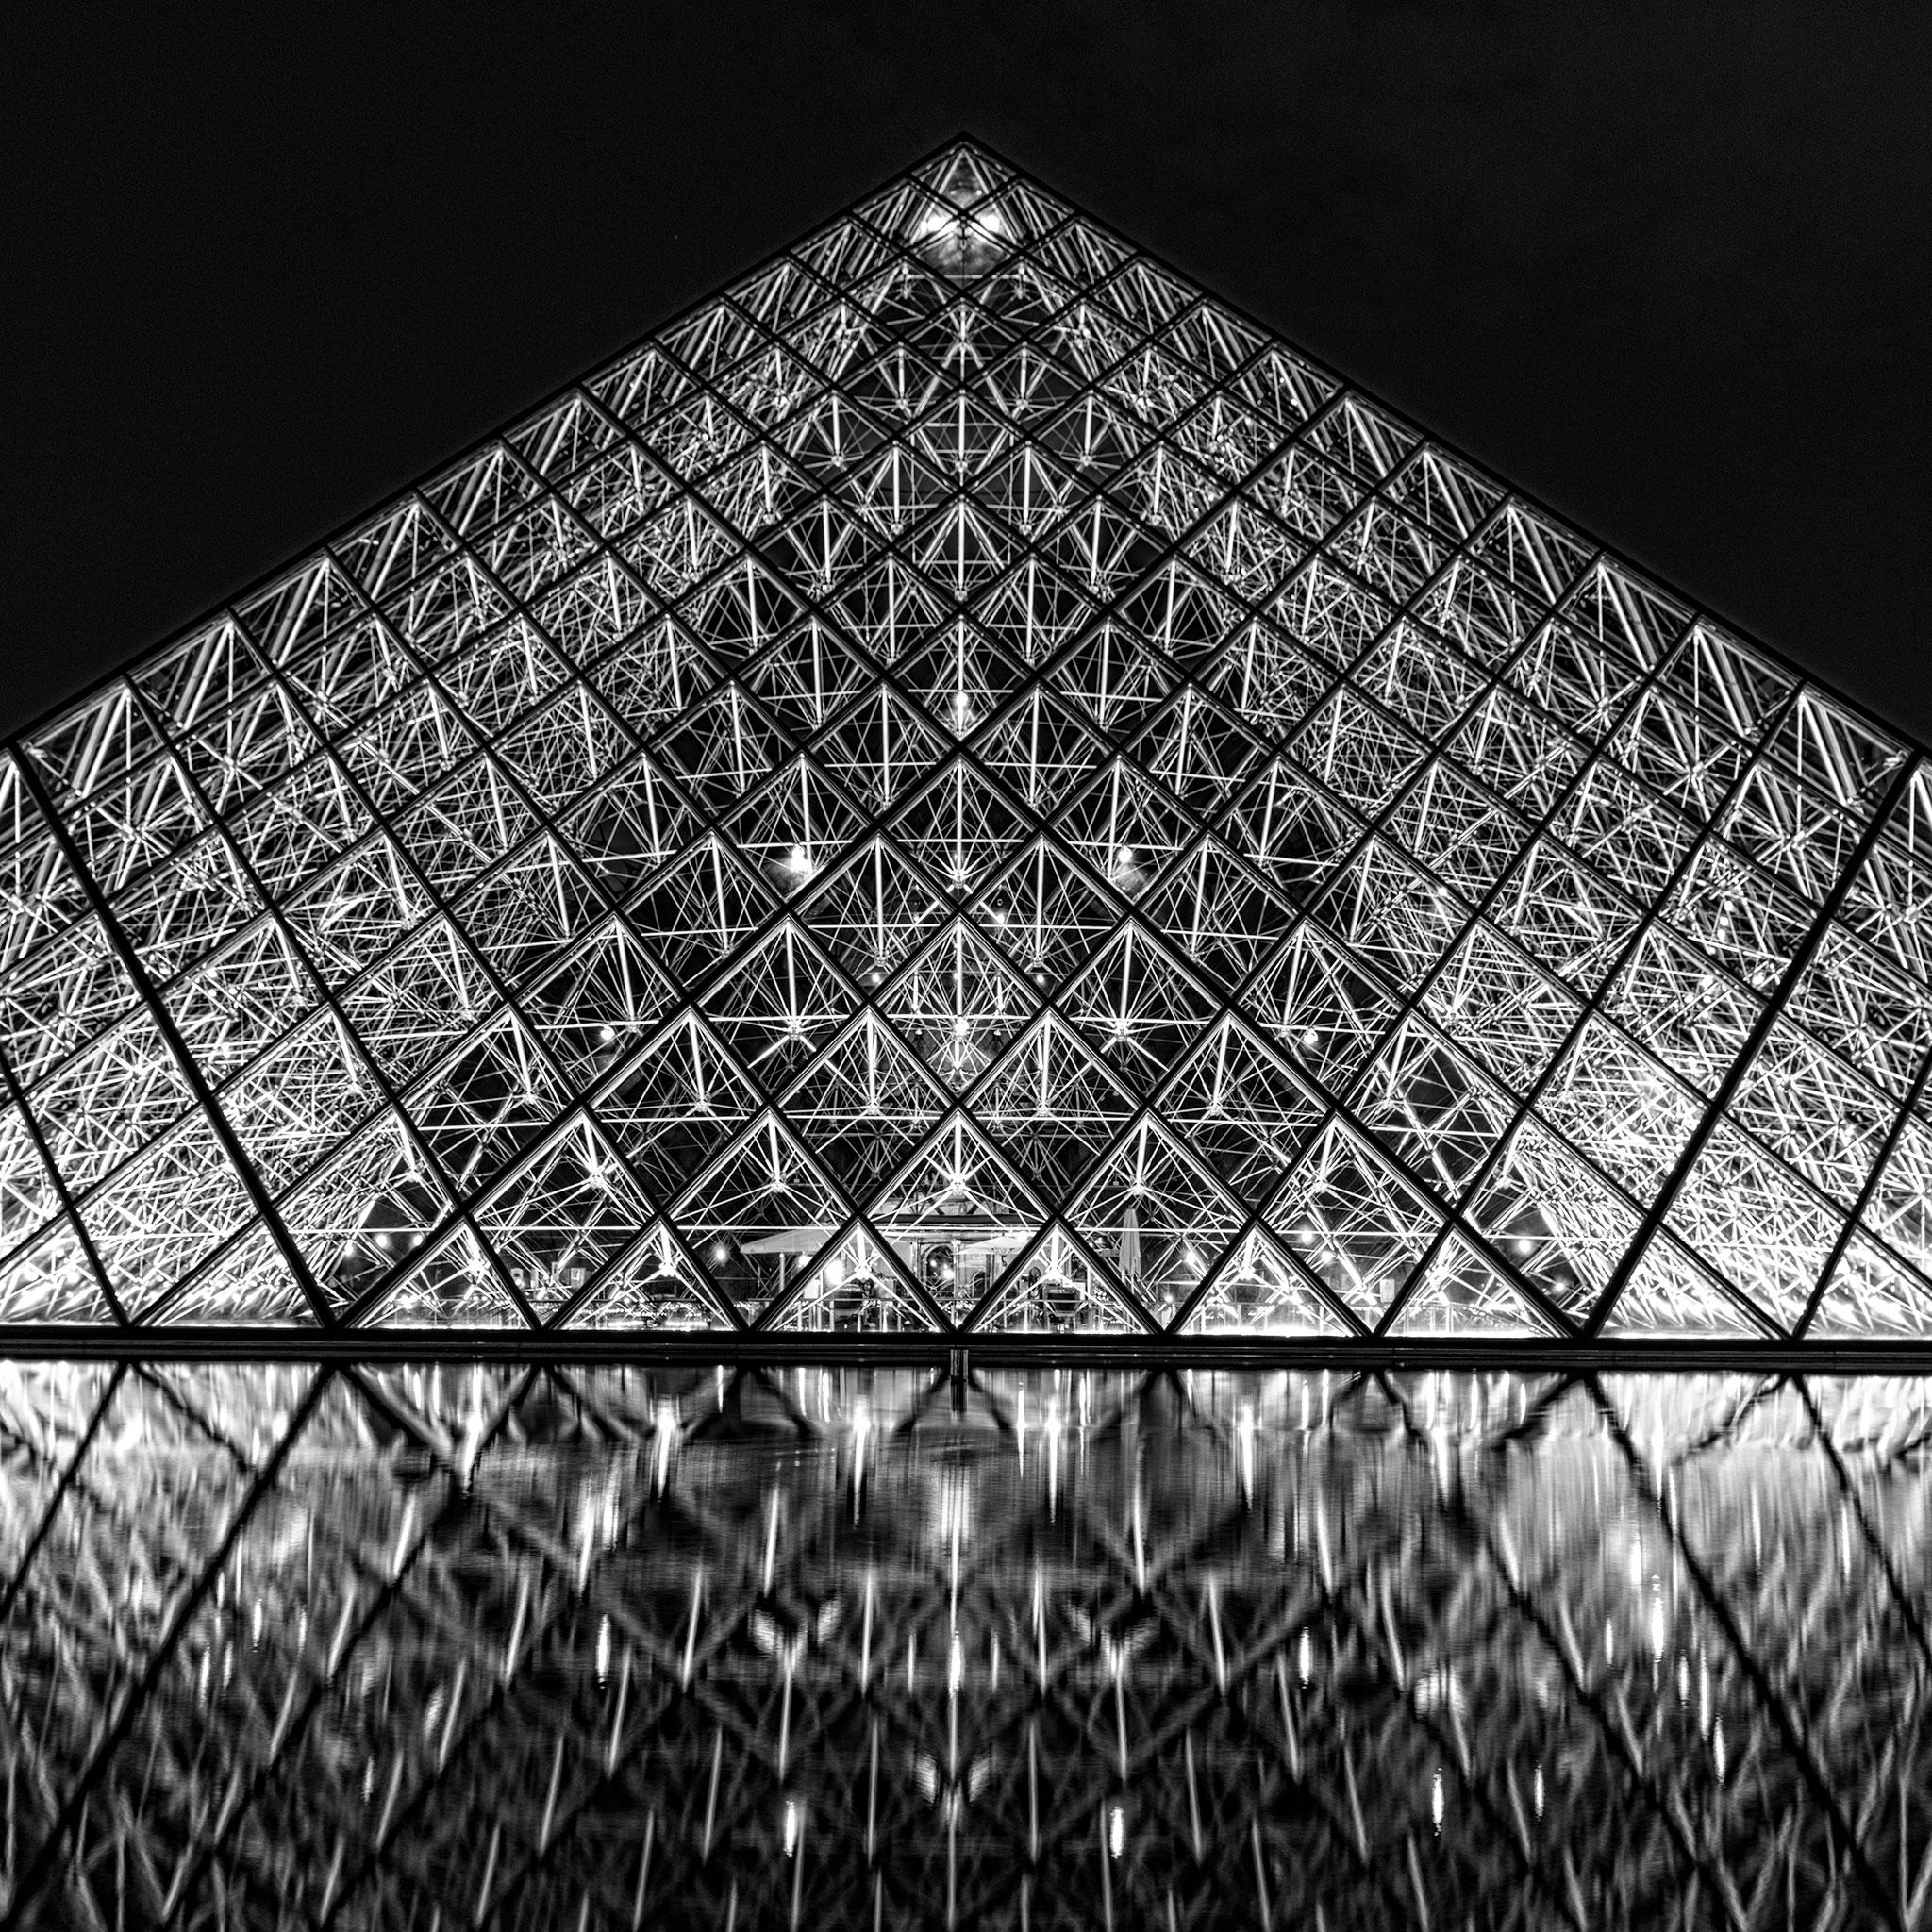 B&W Louvre Pyramid